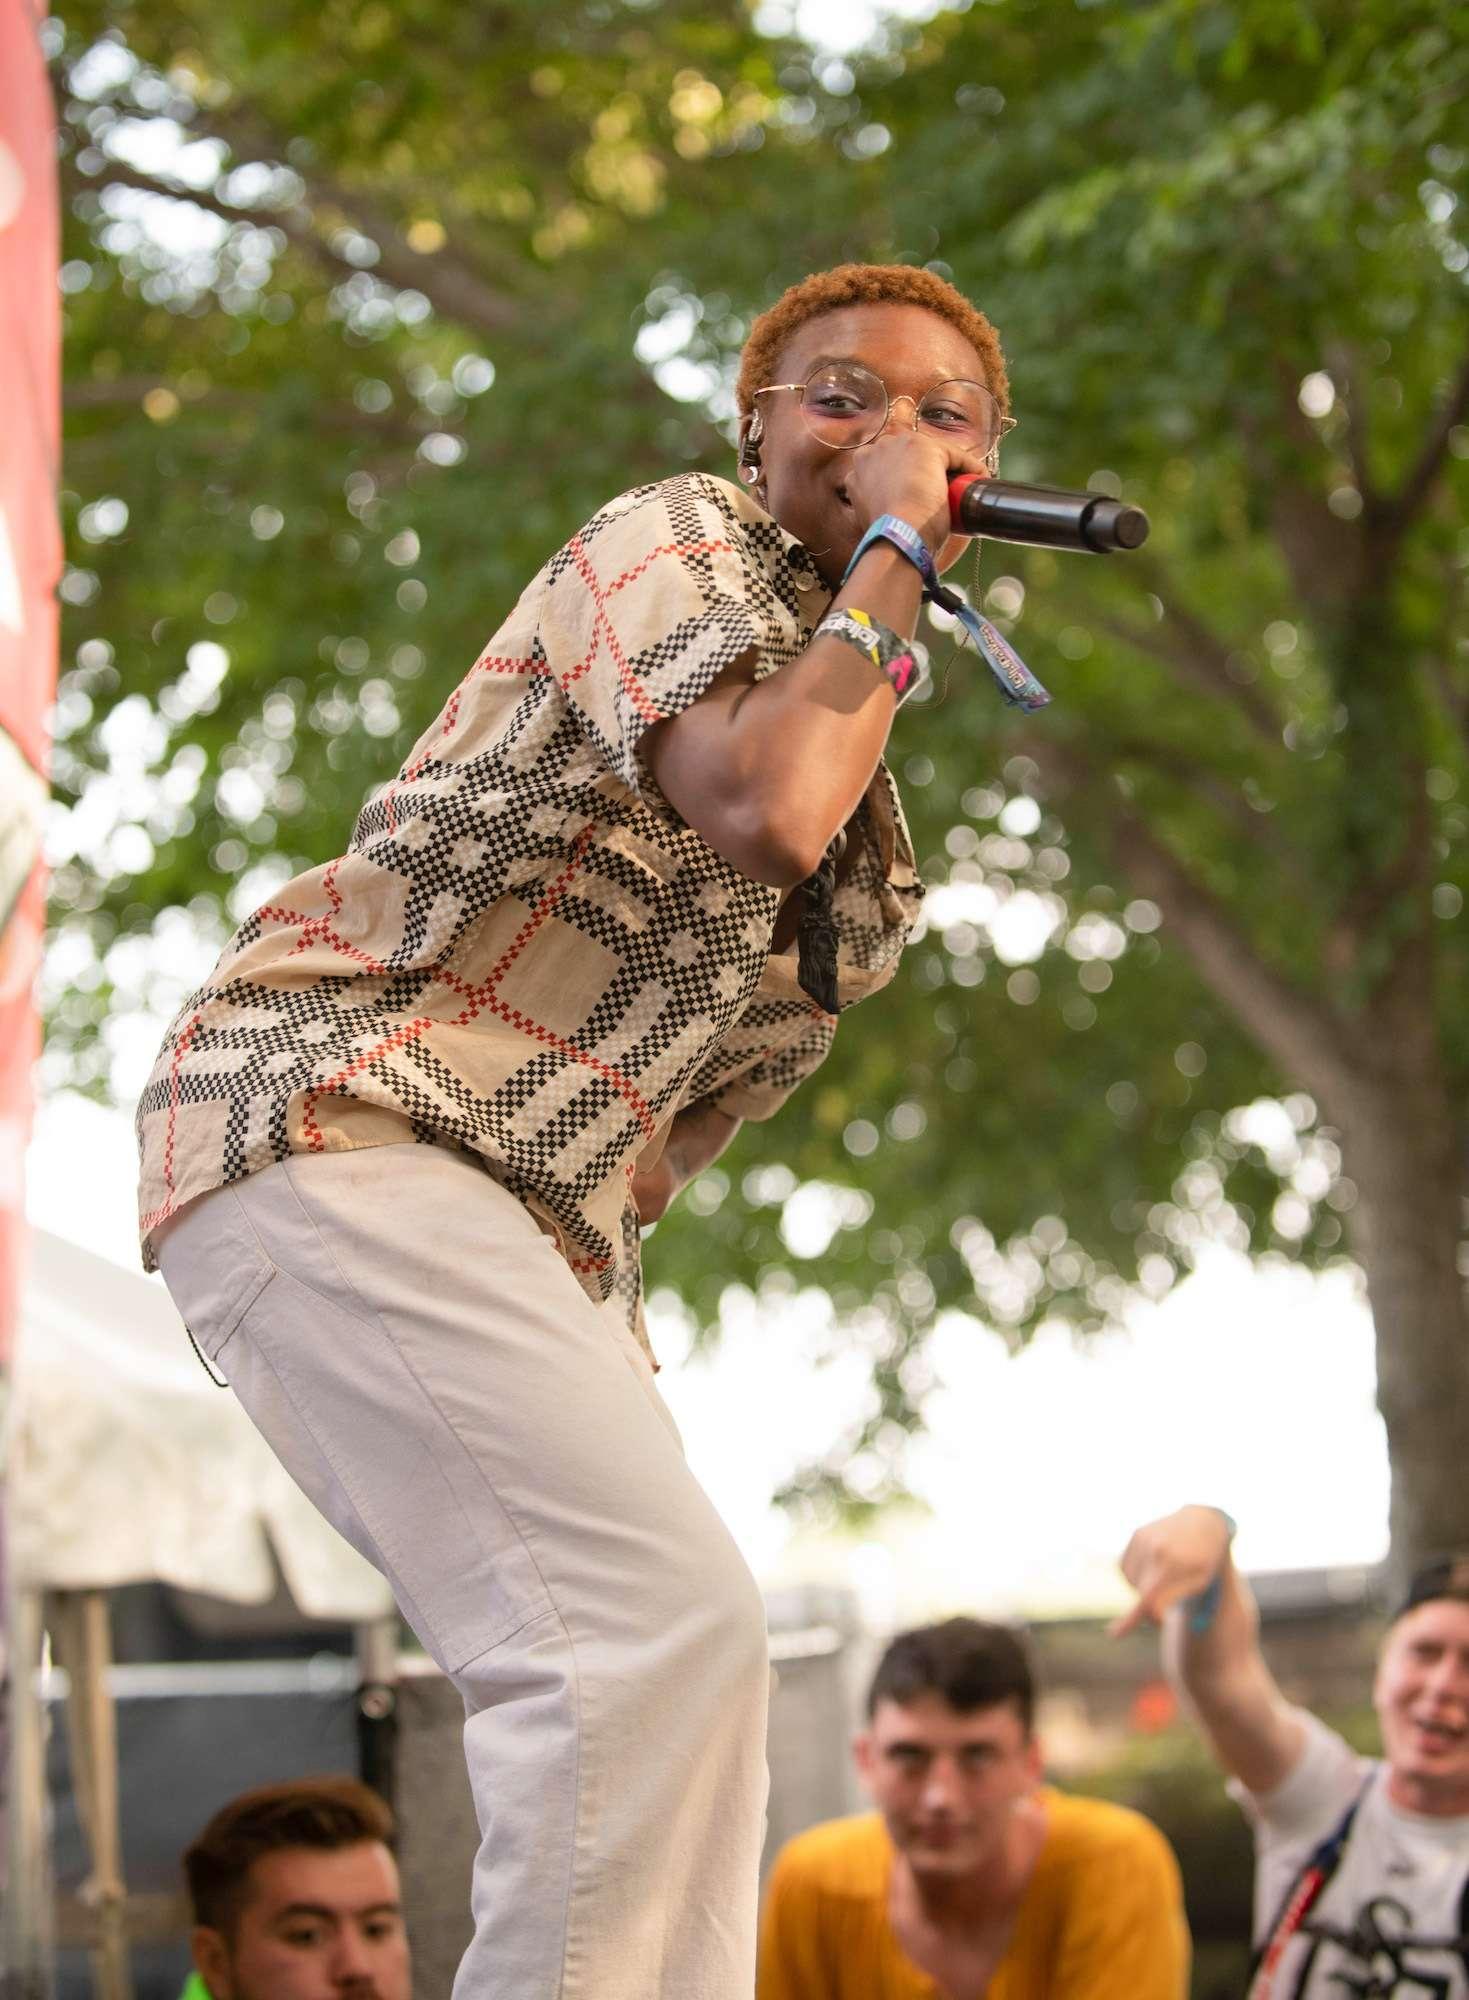 Serena Isioma Live at Lollapalooza [GALLERY] 4